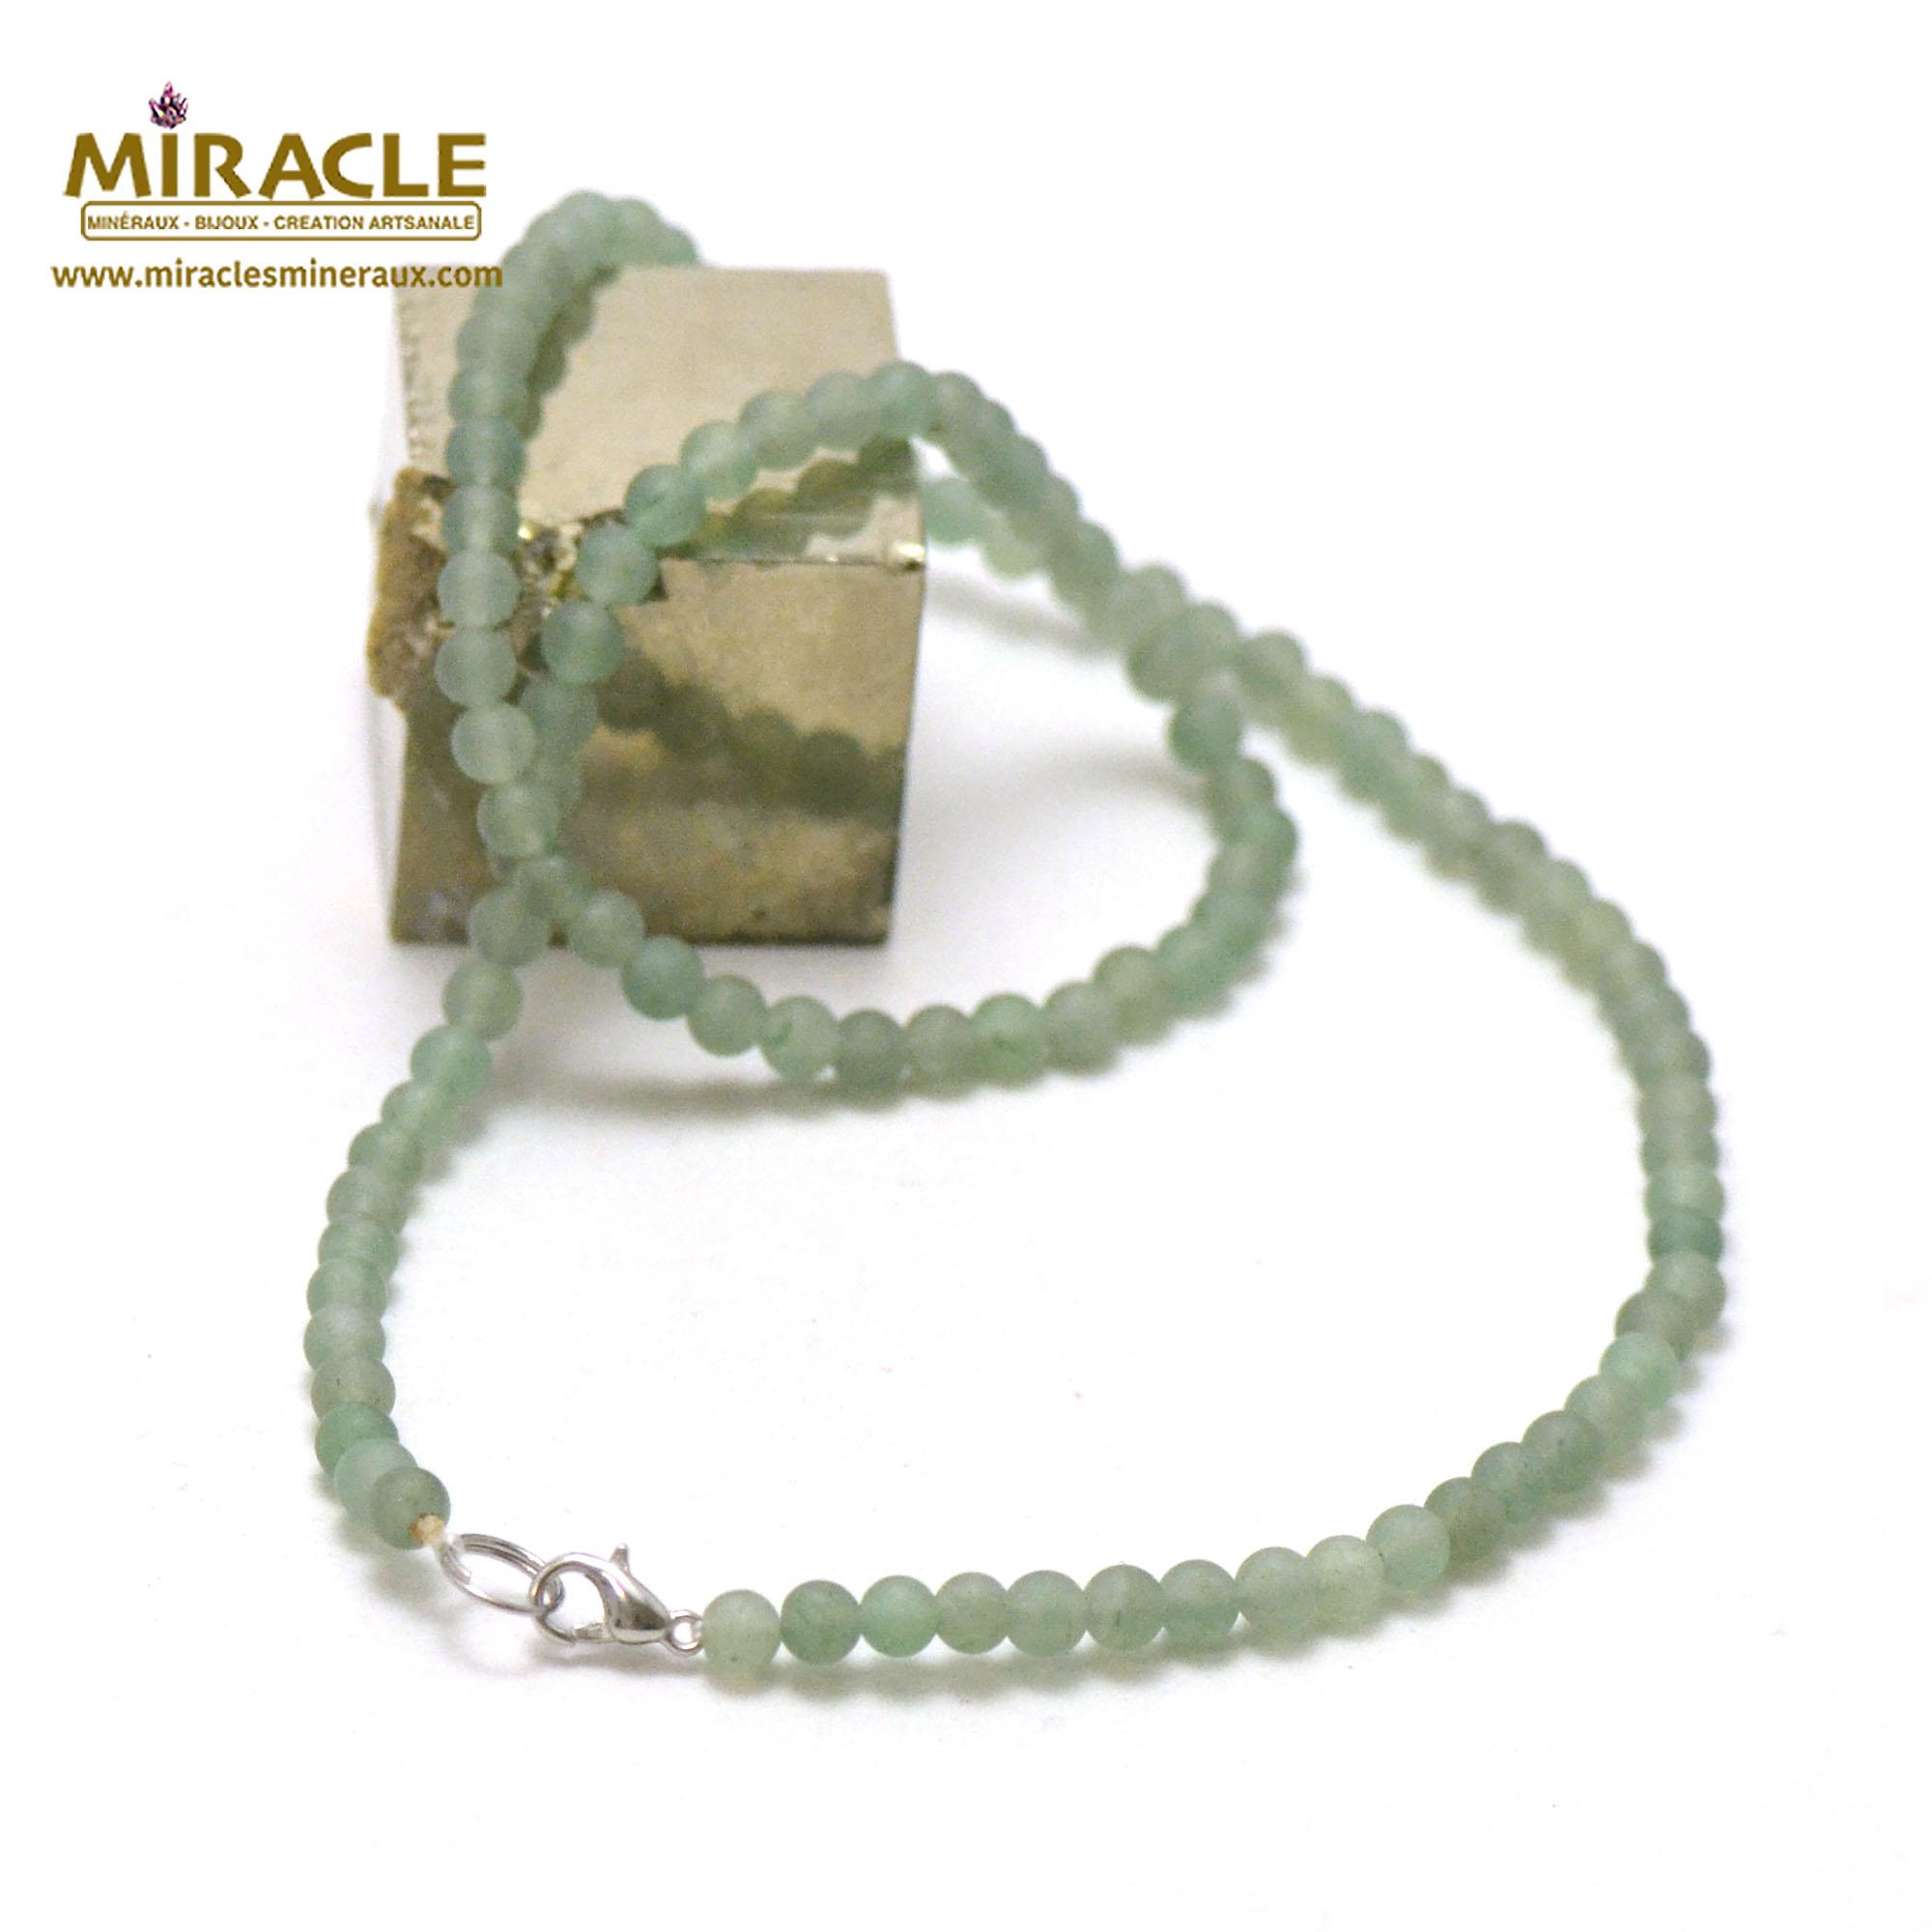 collier aventurine givré perle mat ronde 4 mm